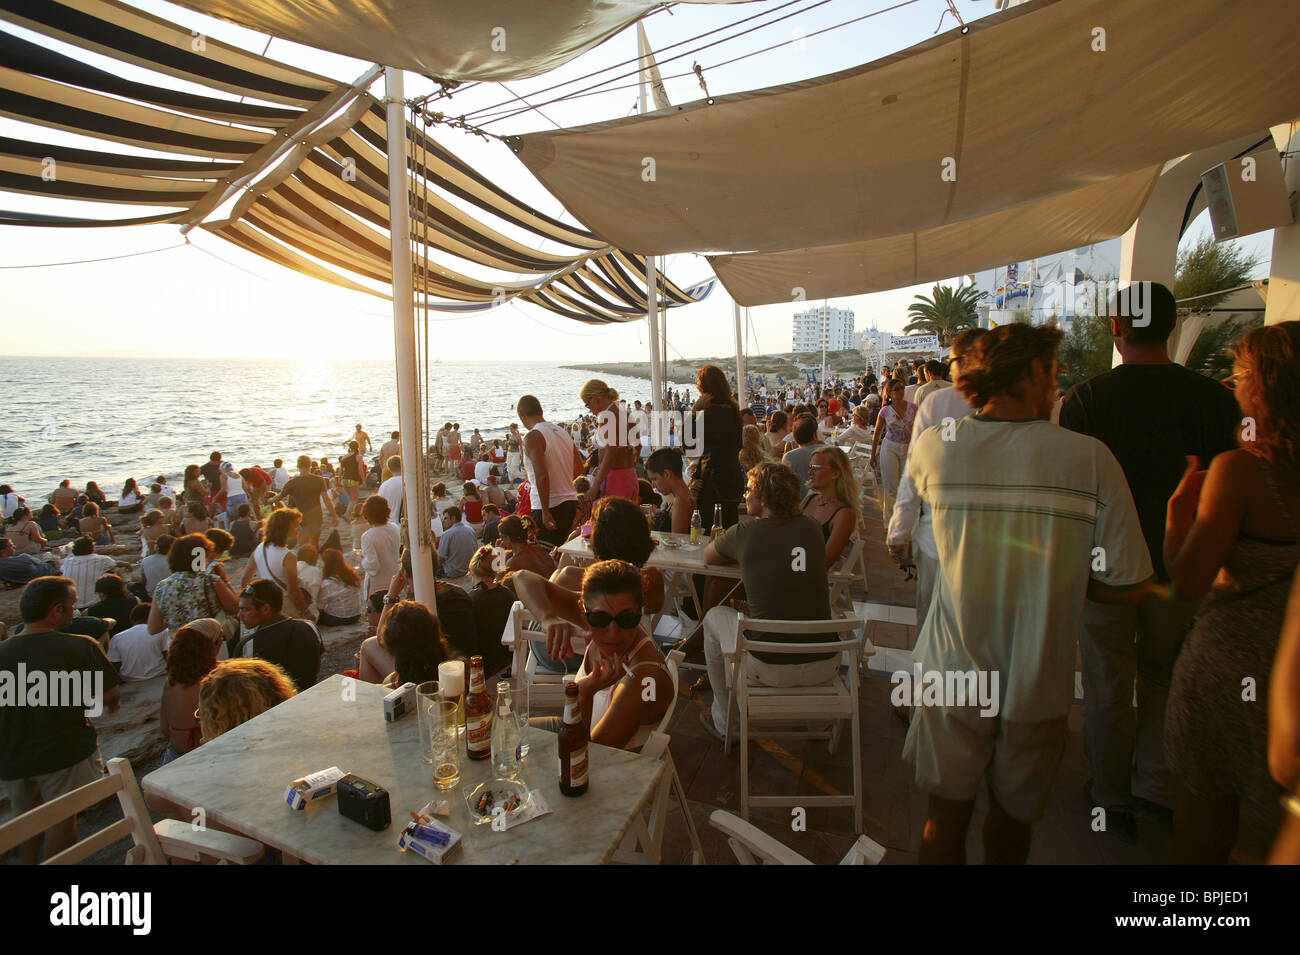 Sunset at Café del Mar, Ibiza, Balearic Island, Spain - Stock Image